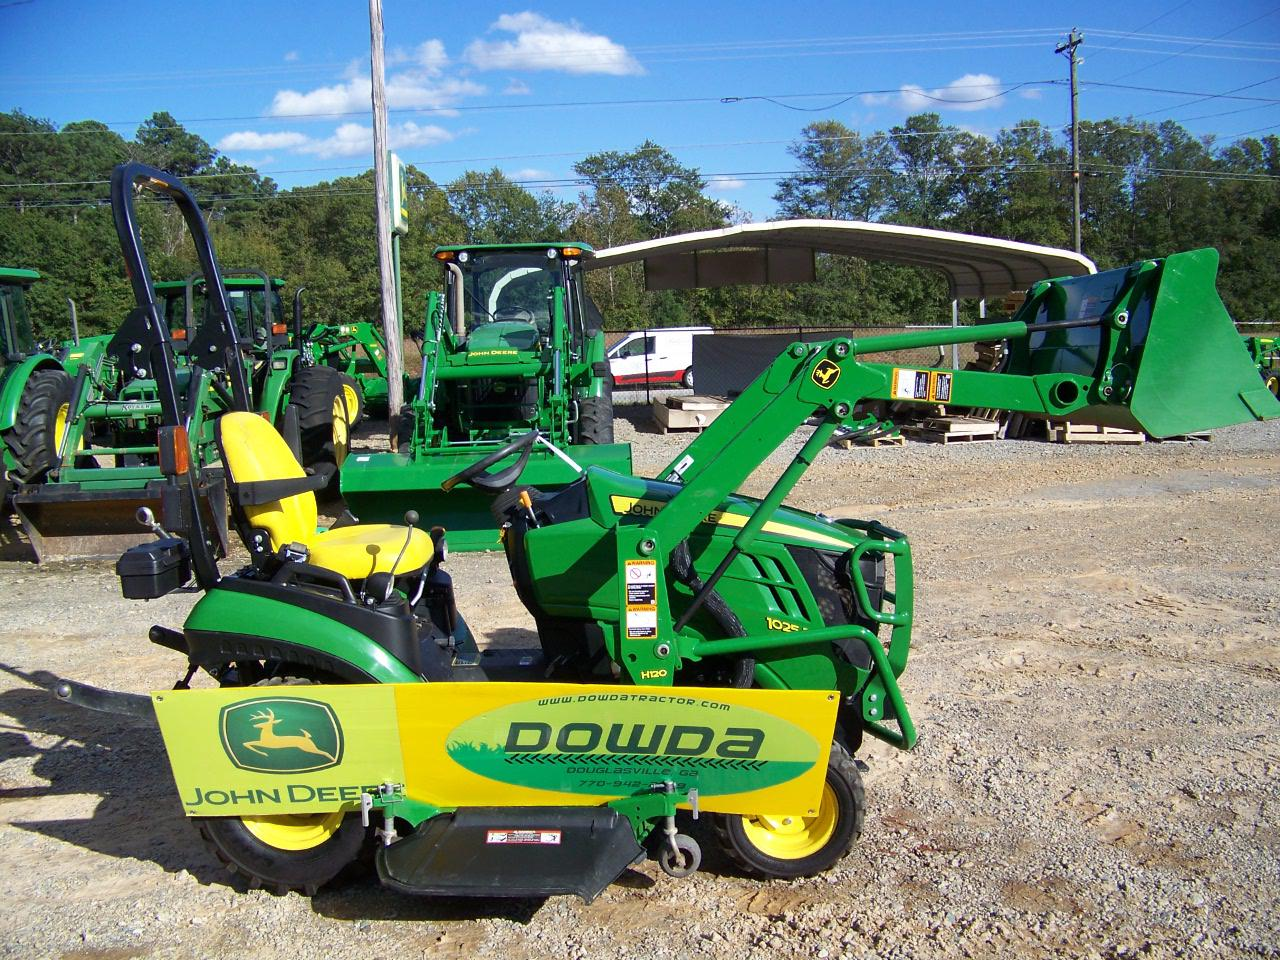 2015 john deere 1025r for sale in douglasville ga dowda farm